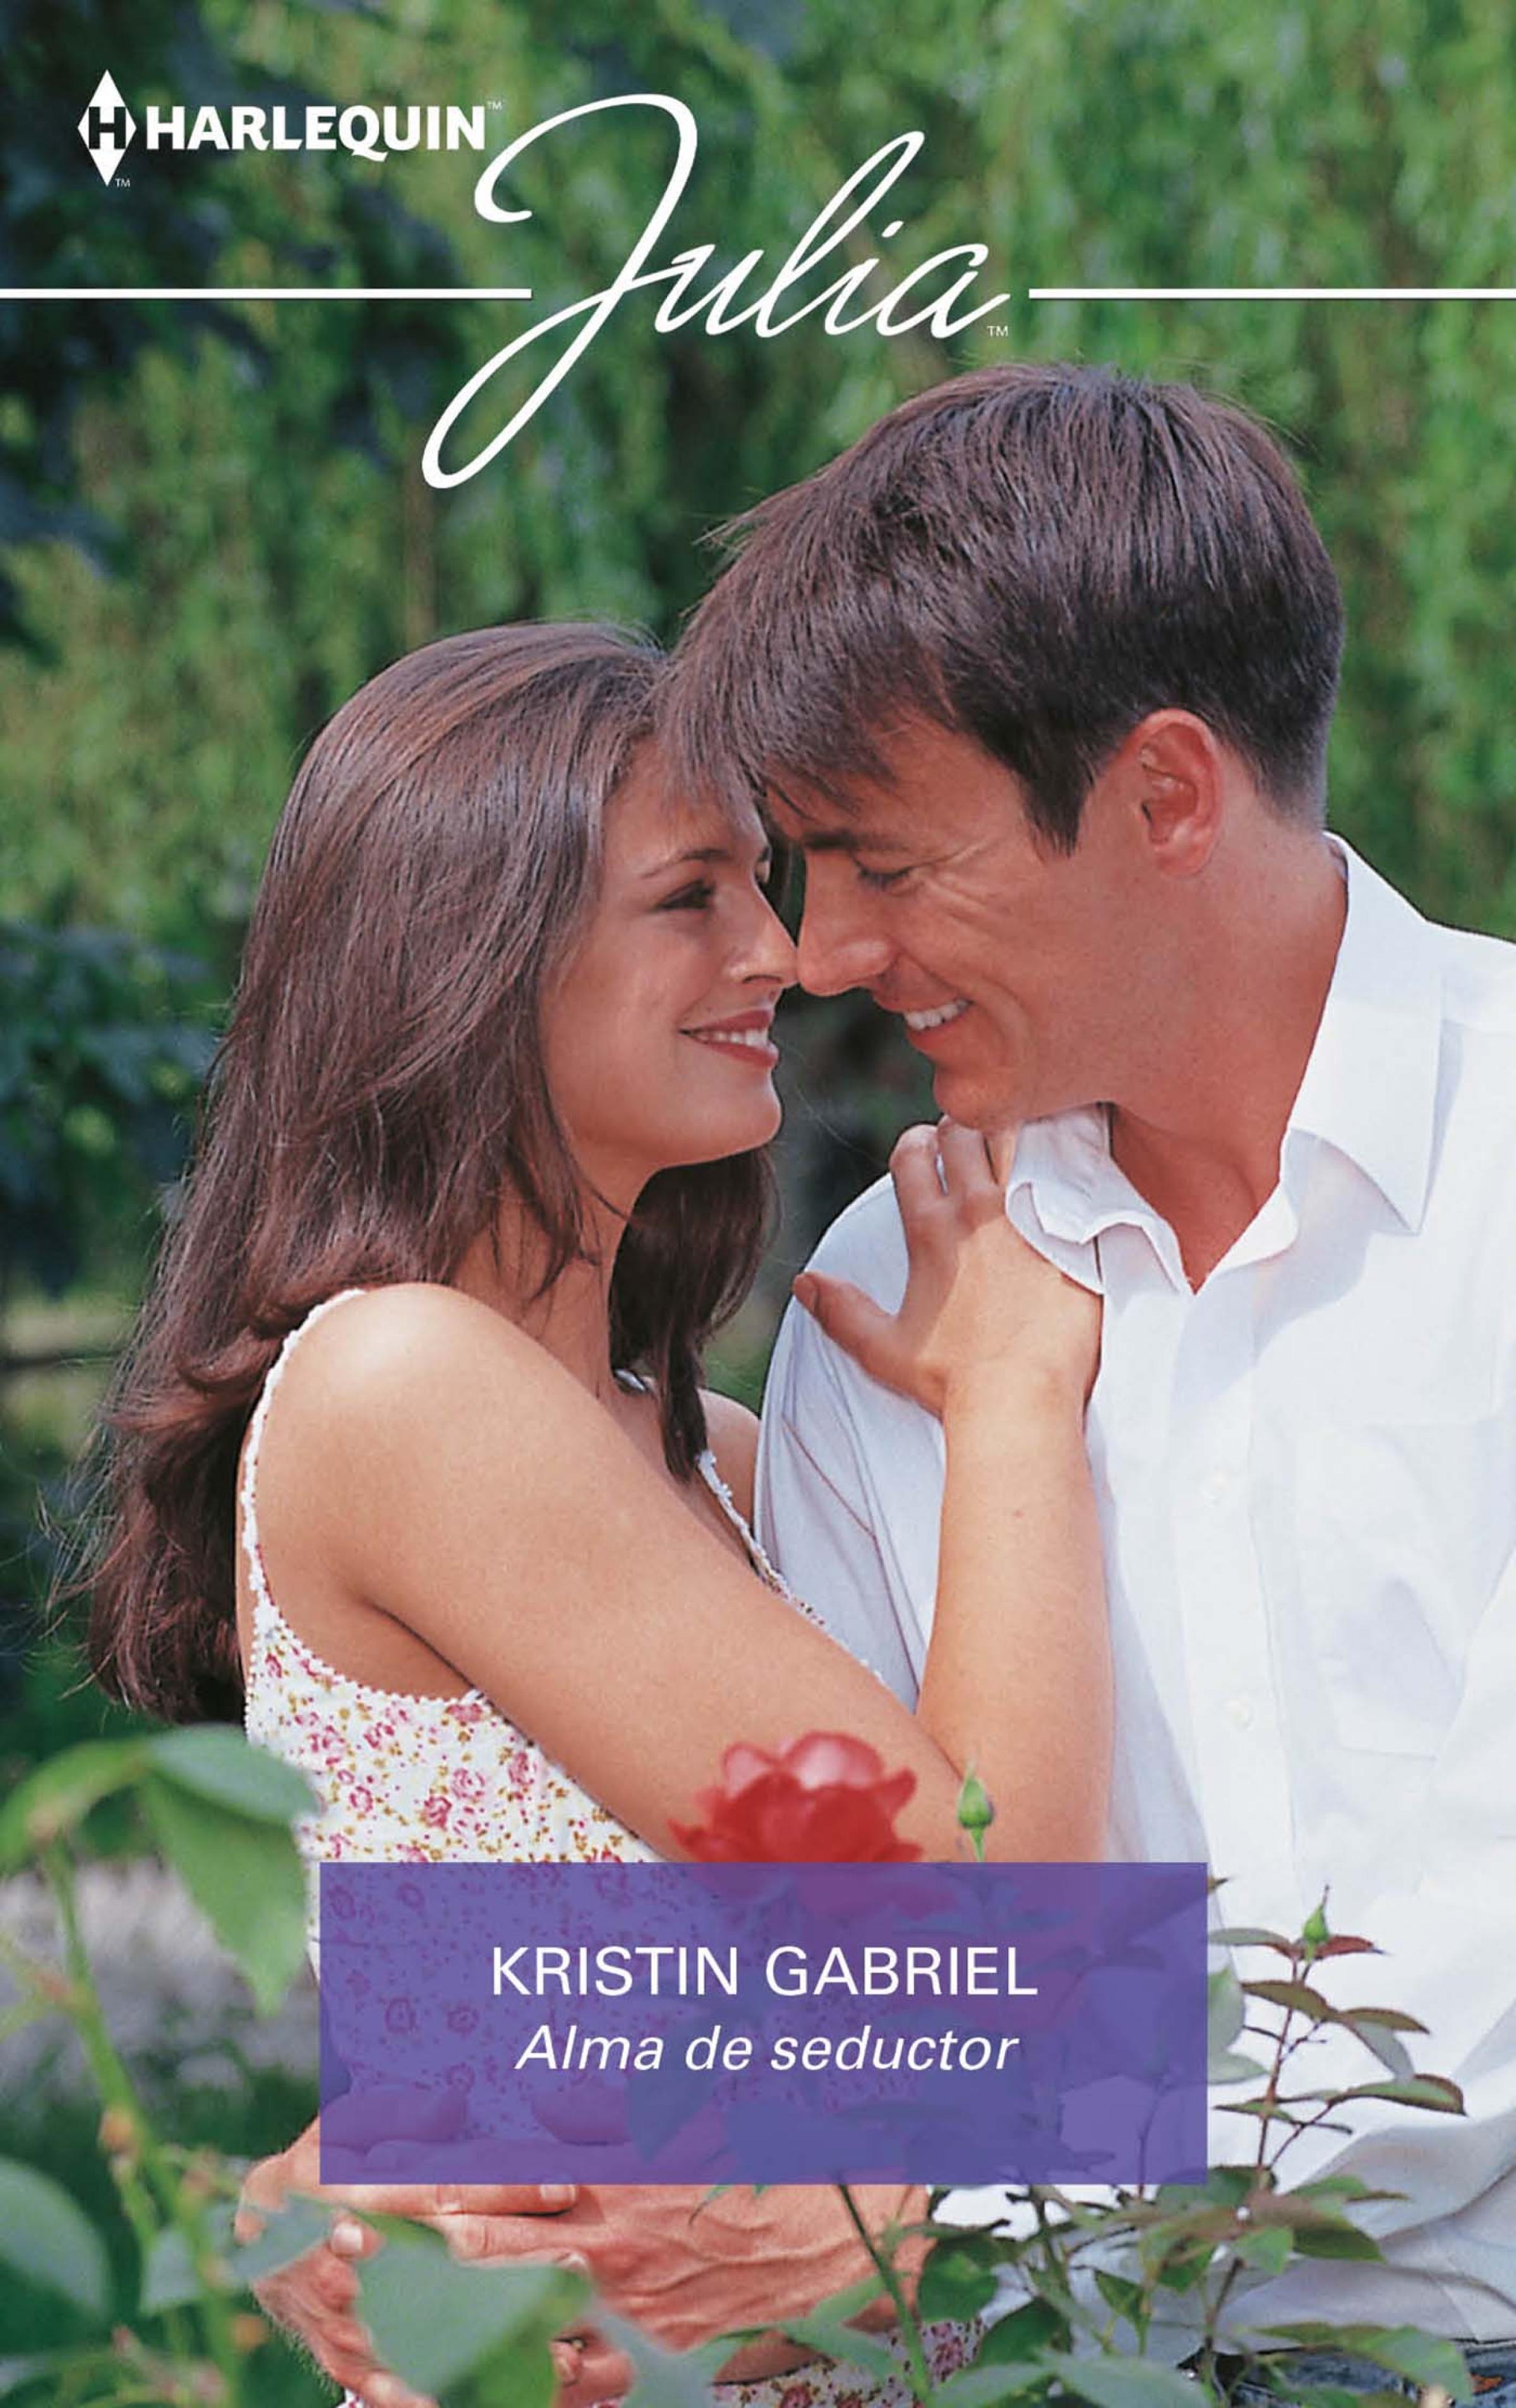 Kristin Gabriel Alma de seductor kristin gabriel en busca de marido